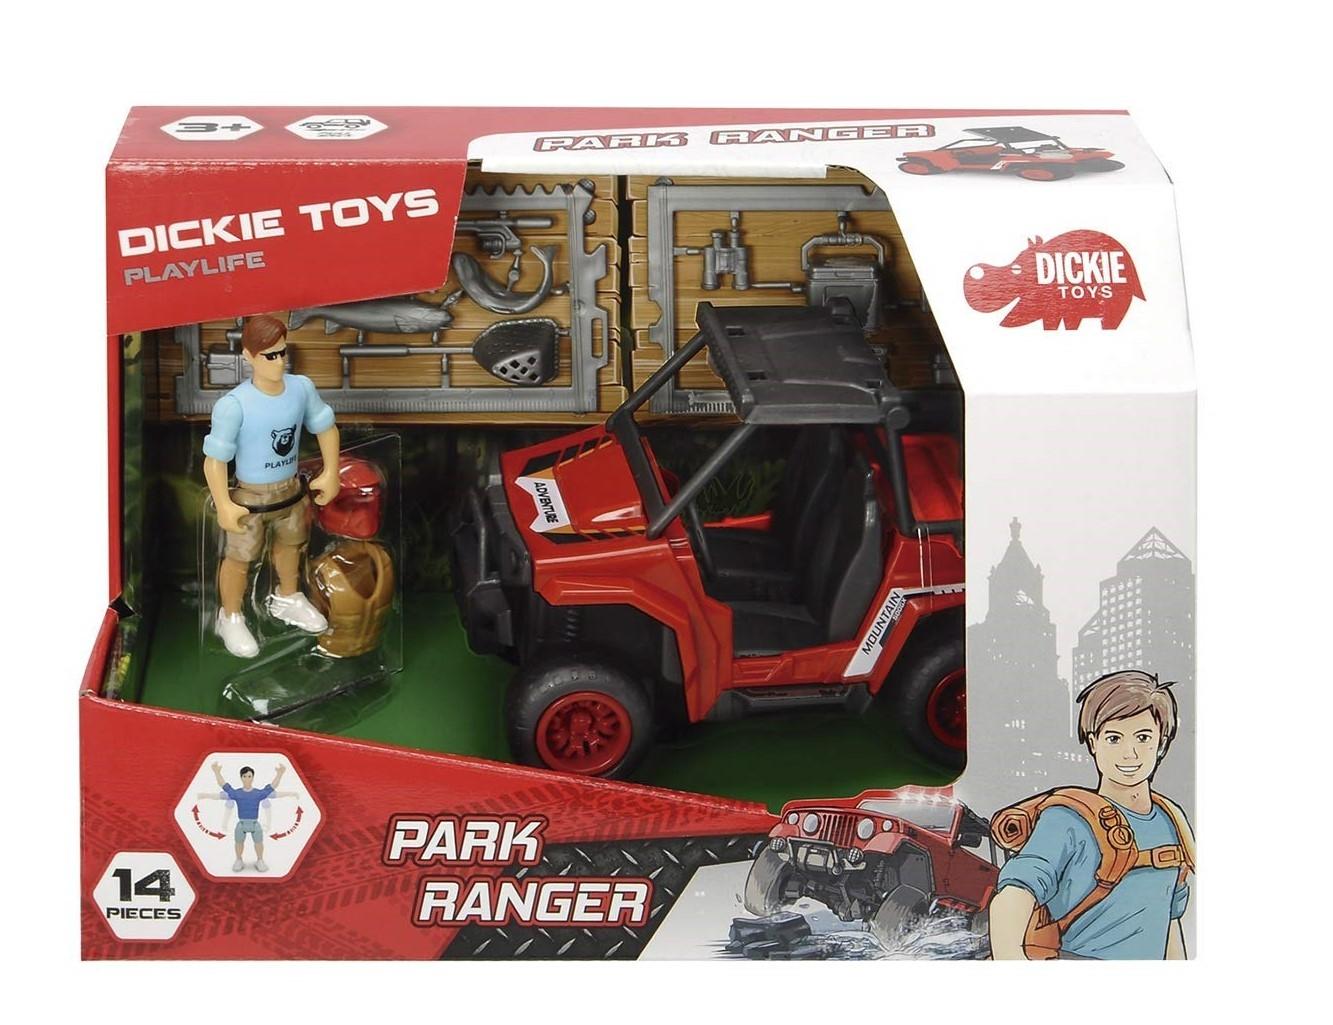 PLAYLIFE - PARK RANGER 383-3005 SIMBA NEW